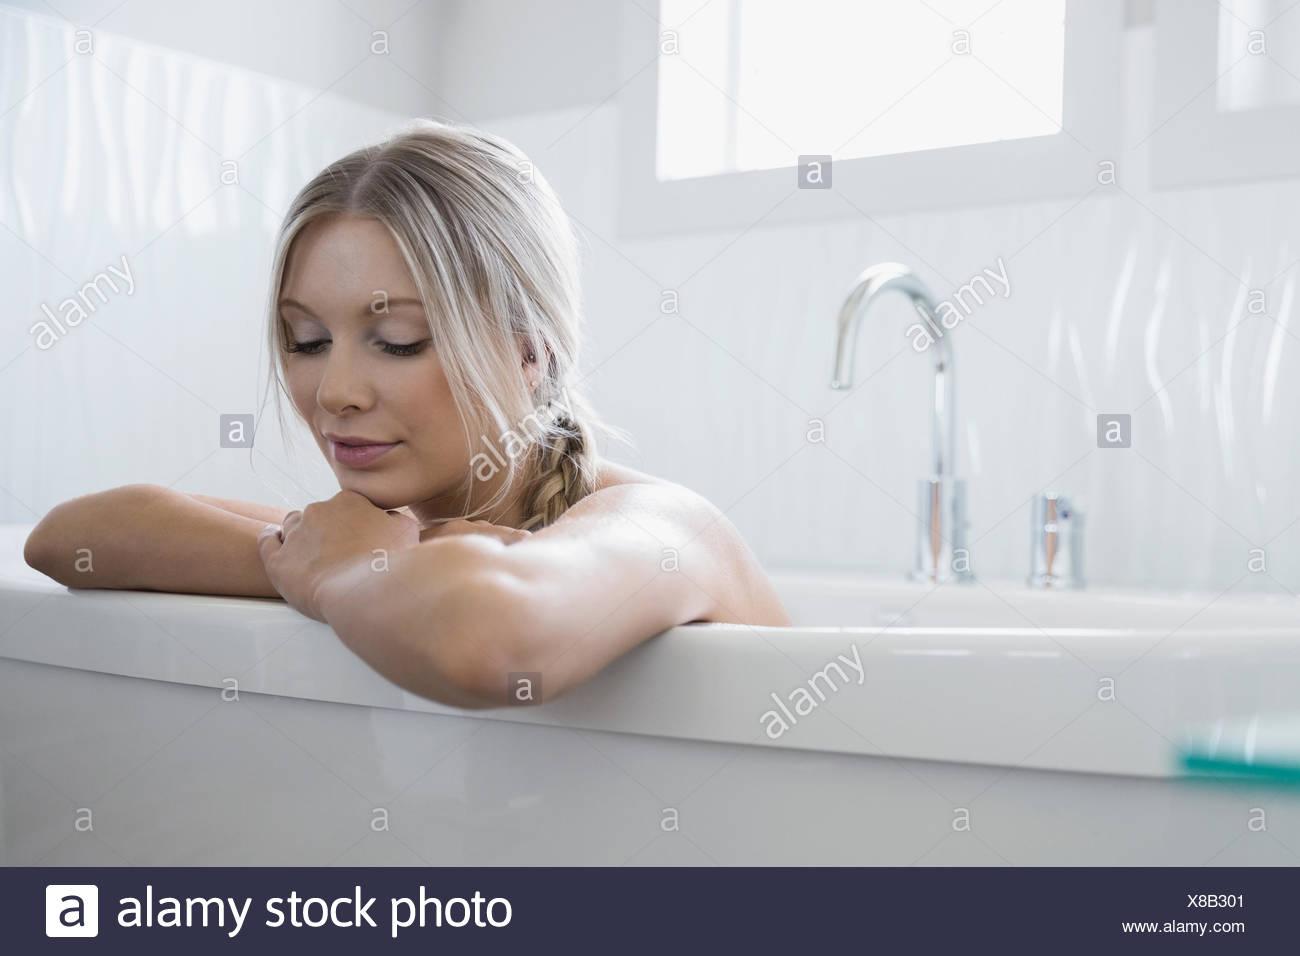 Calm woman relaxing in bathtub Photo Stock